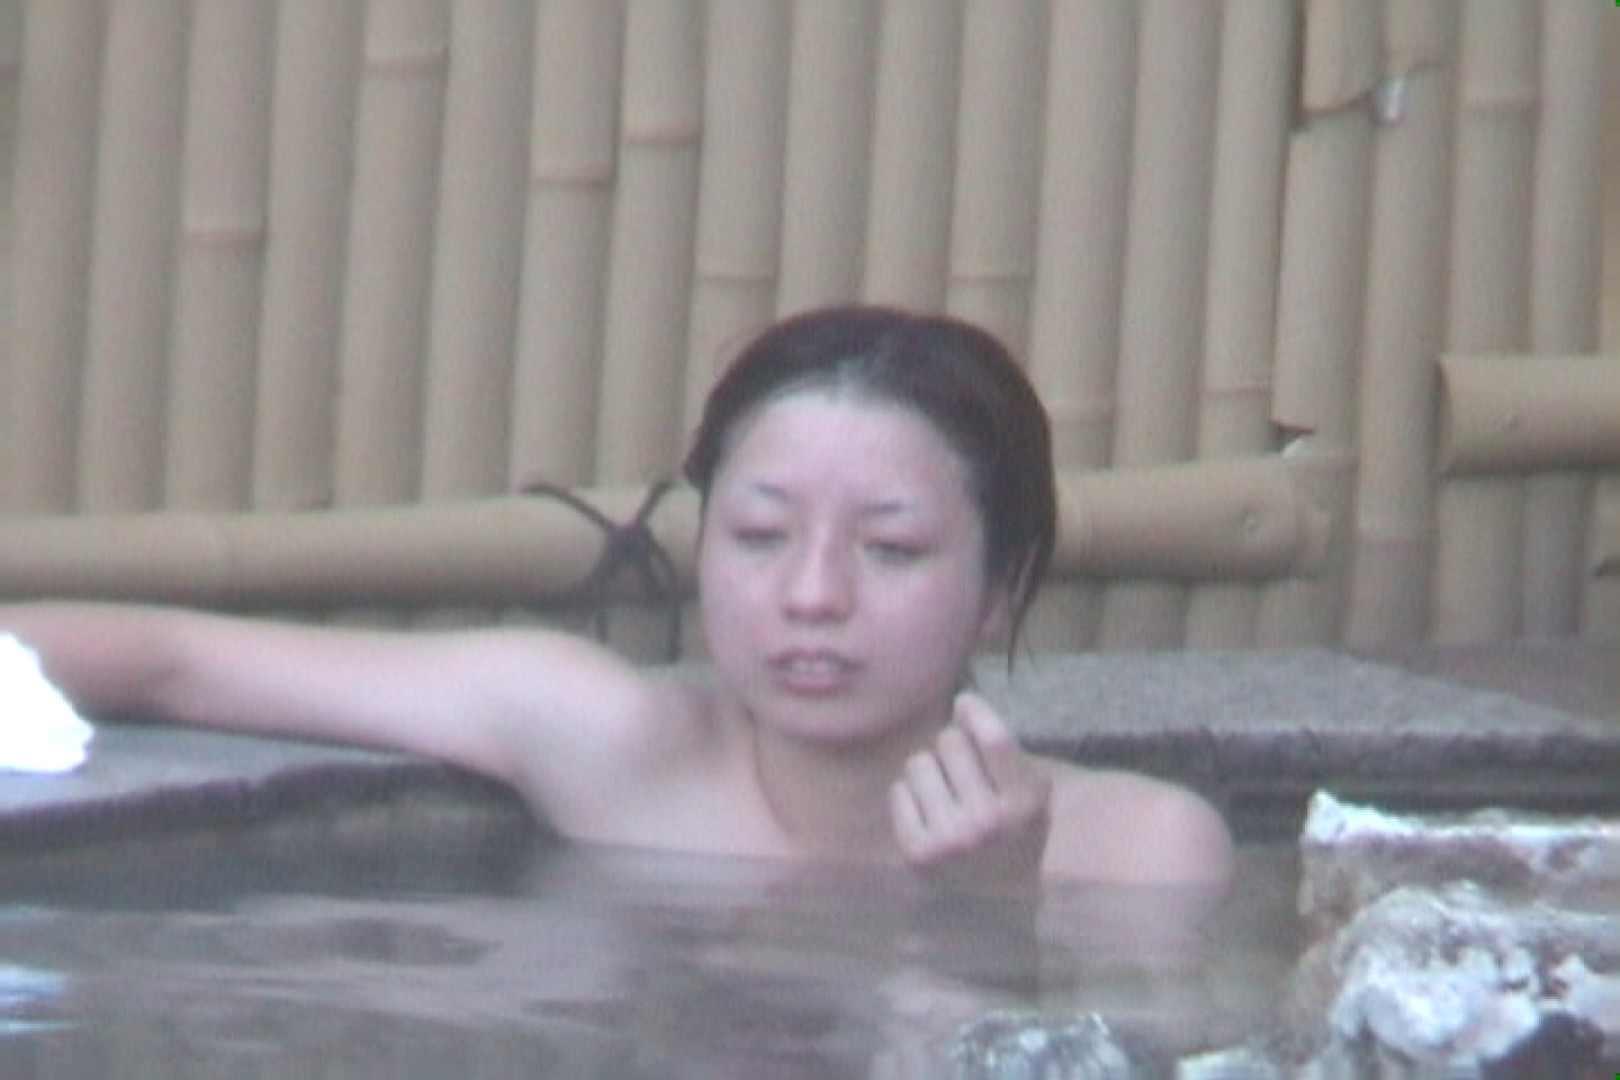 Aquaな露天風呂Vol.608 美しいOLの裸体 AV動画キャプチャ 95pic 86